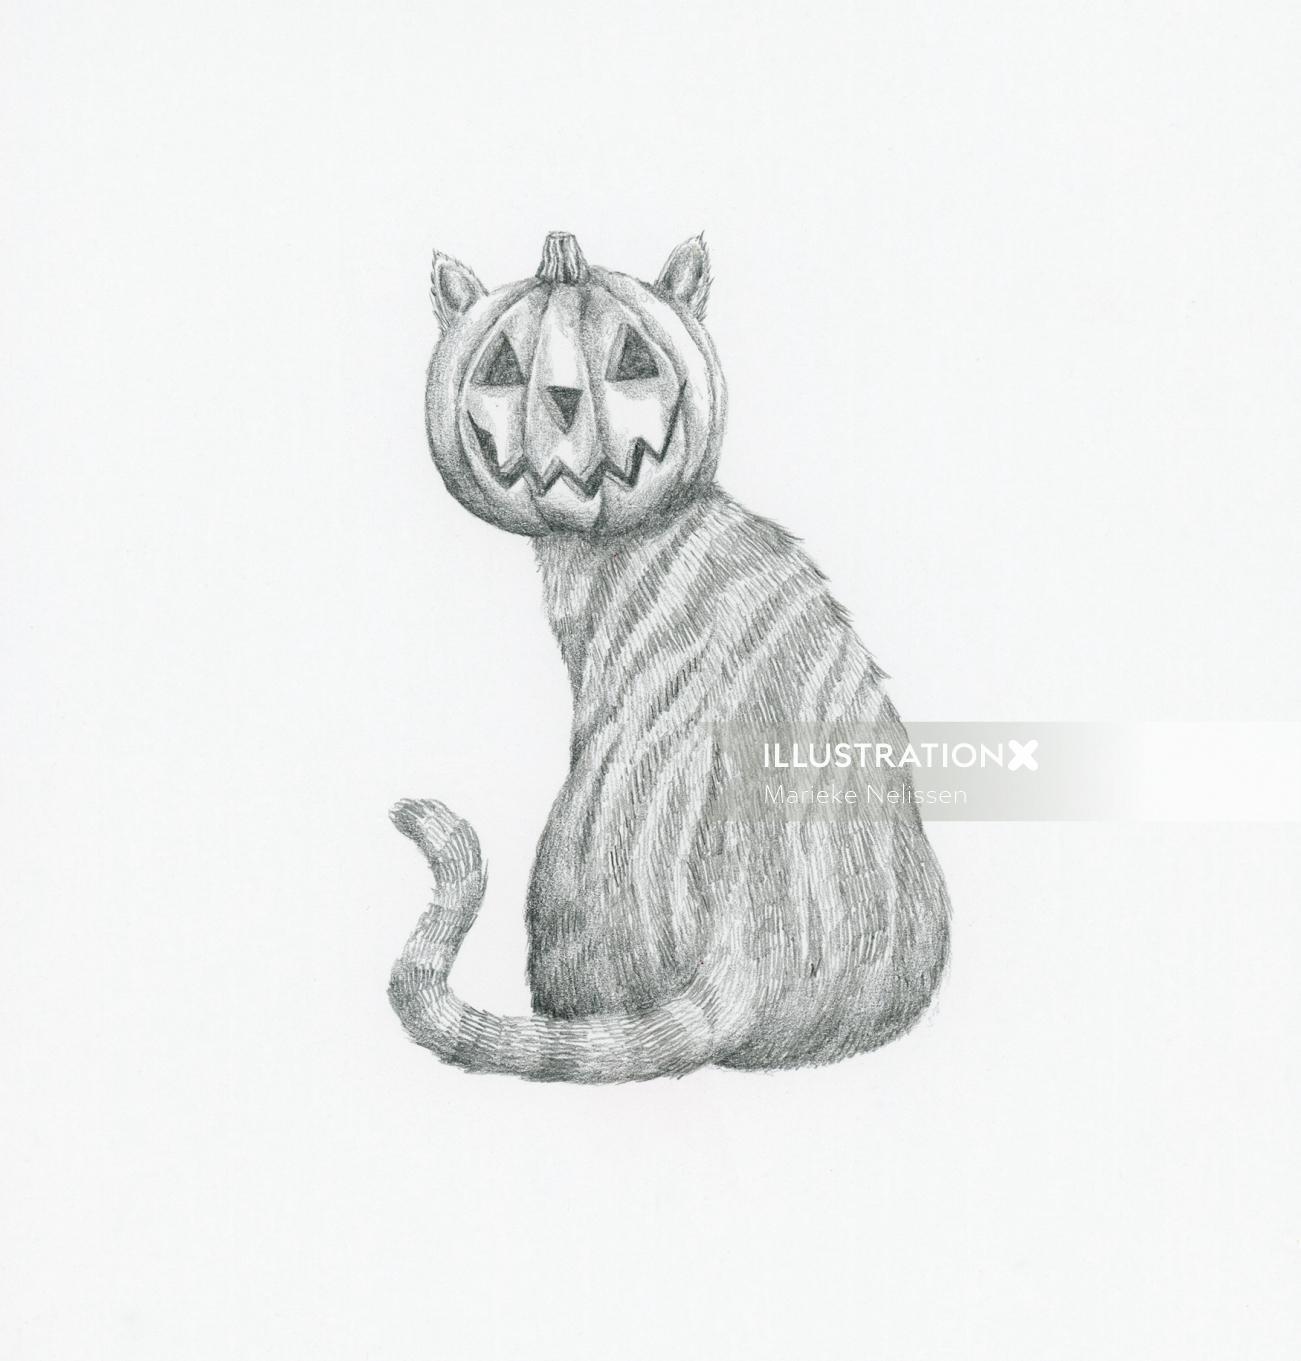 Cat with a pumpkin head